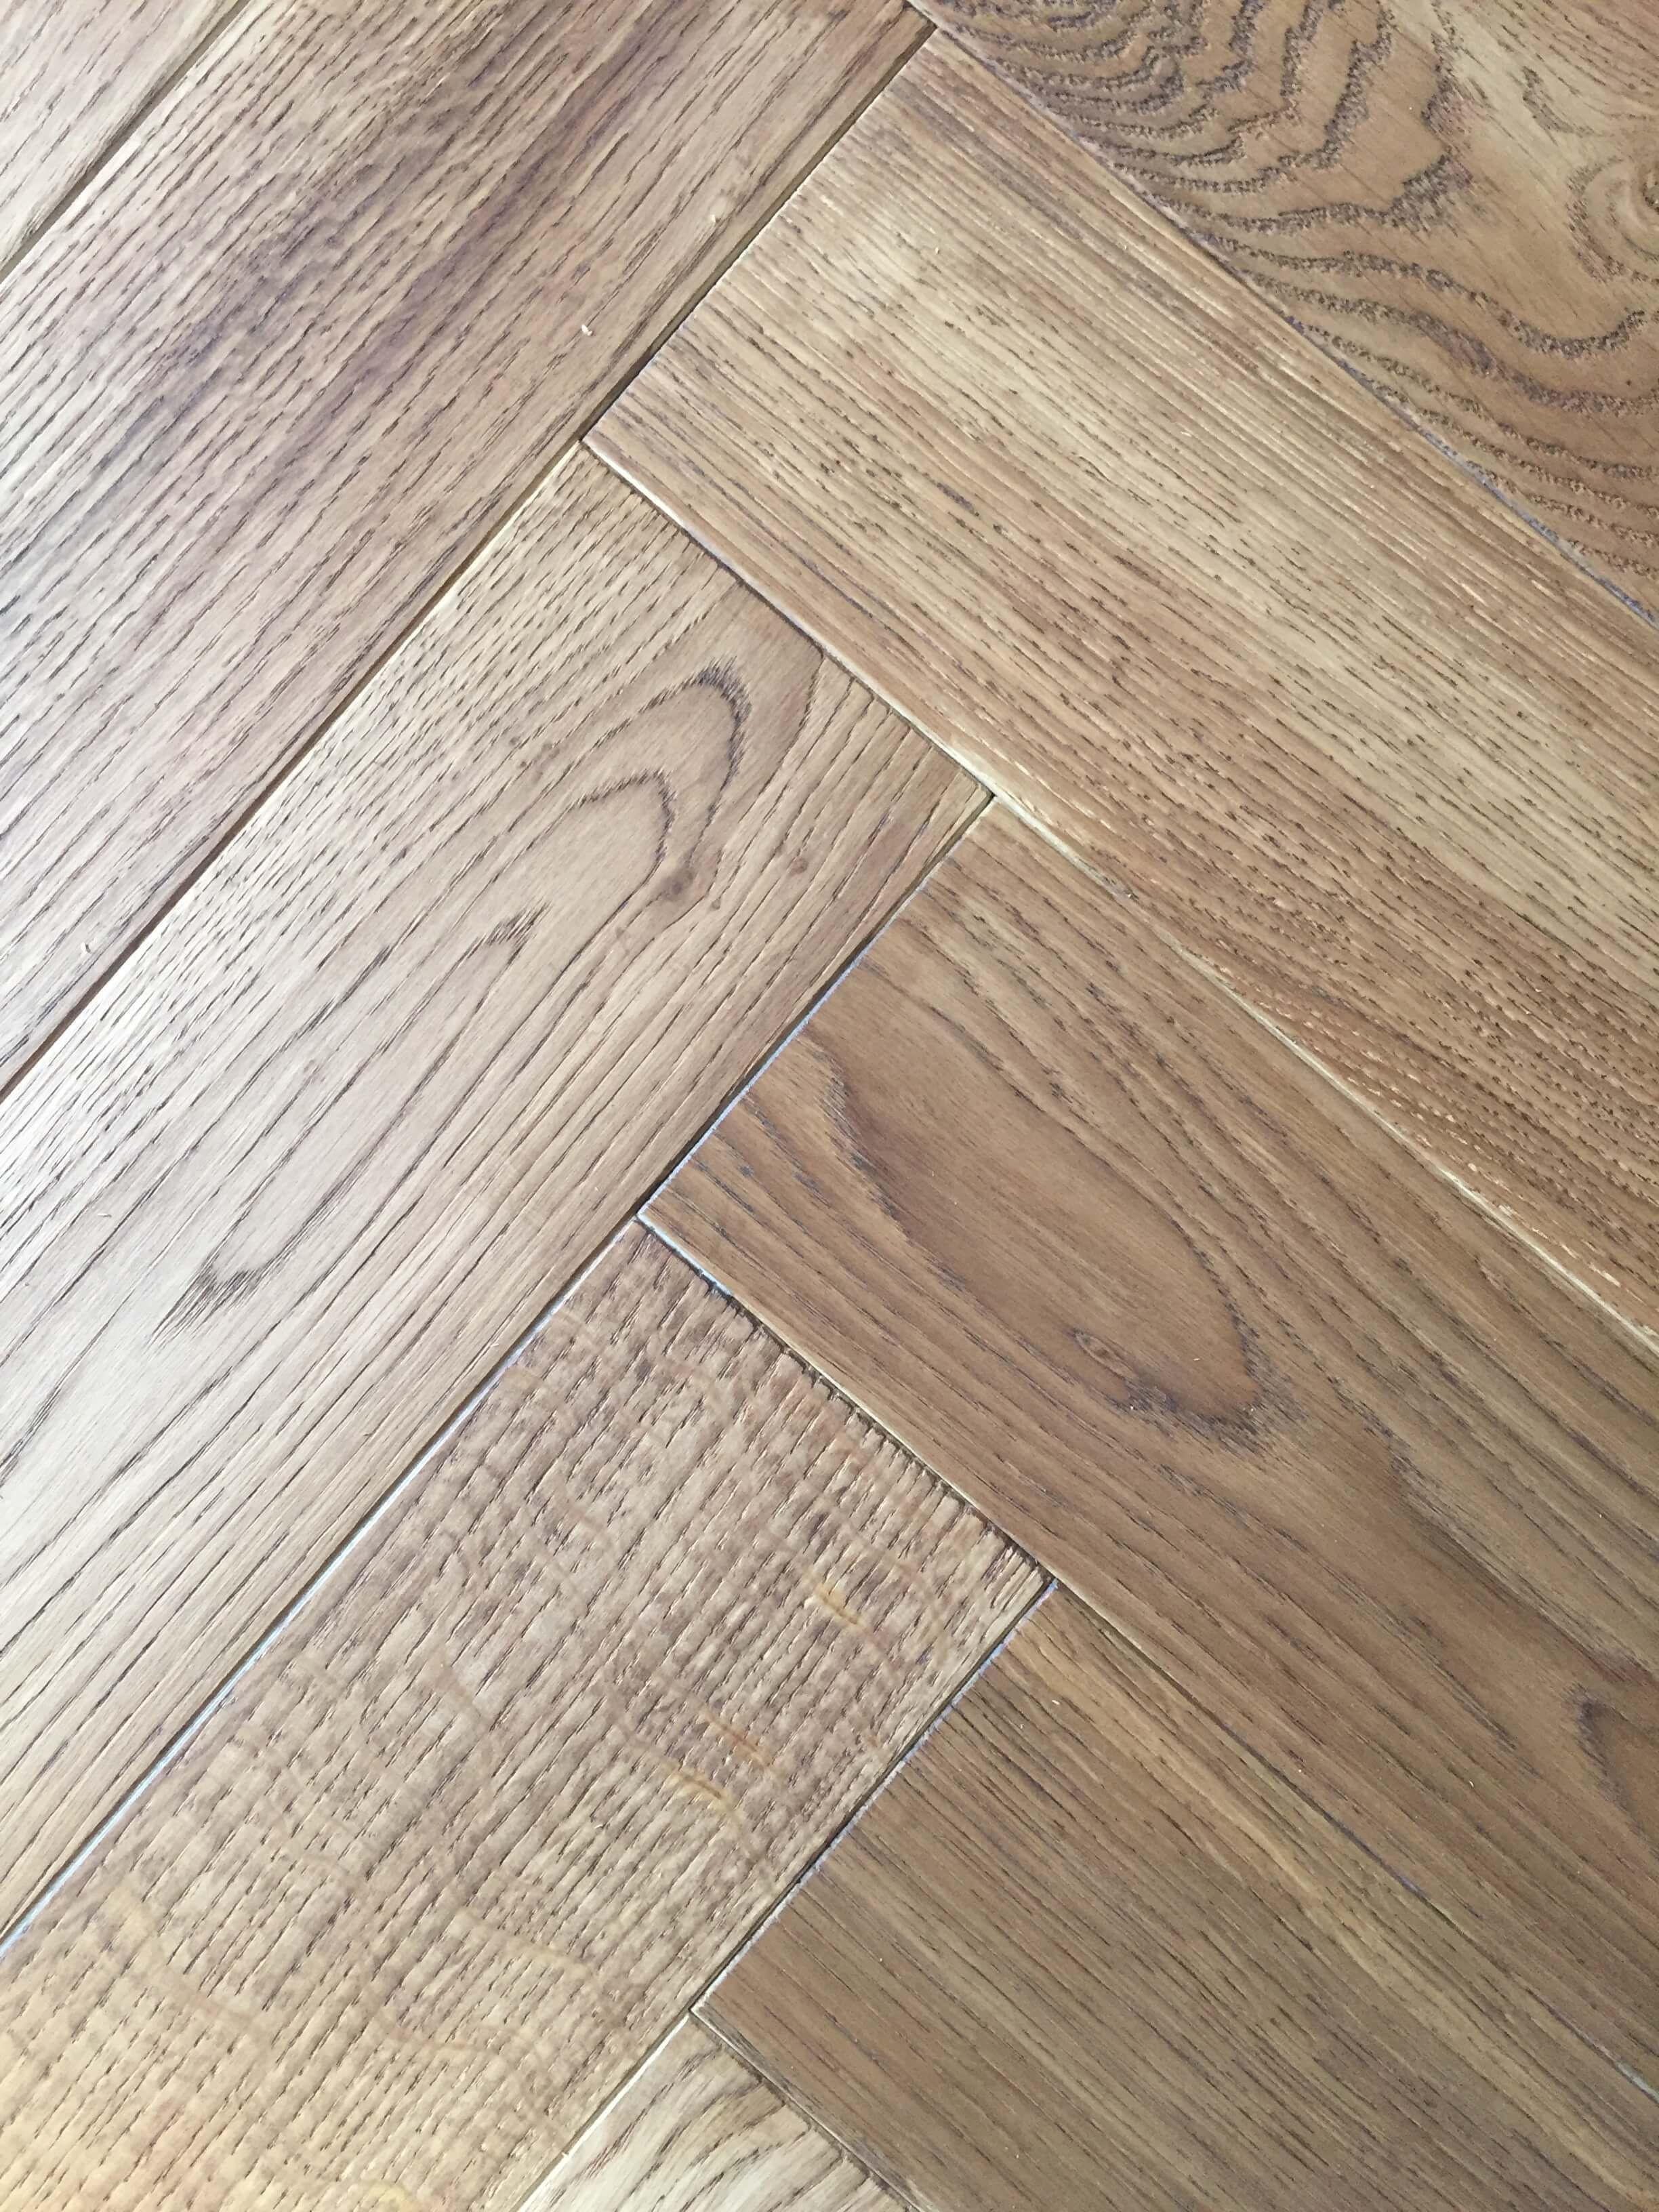 high end laminate flooring vs hardwood of roll out laminate wood flooring bamboo vs hardwood flooring new pertaining to roll out laminate wood flooring bamboo vs hardwood flooring new hotel od barcelona projekt parklex